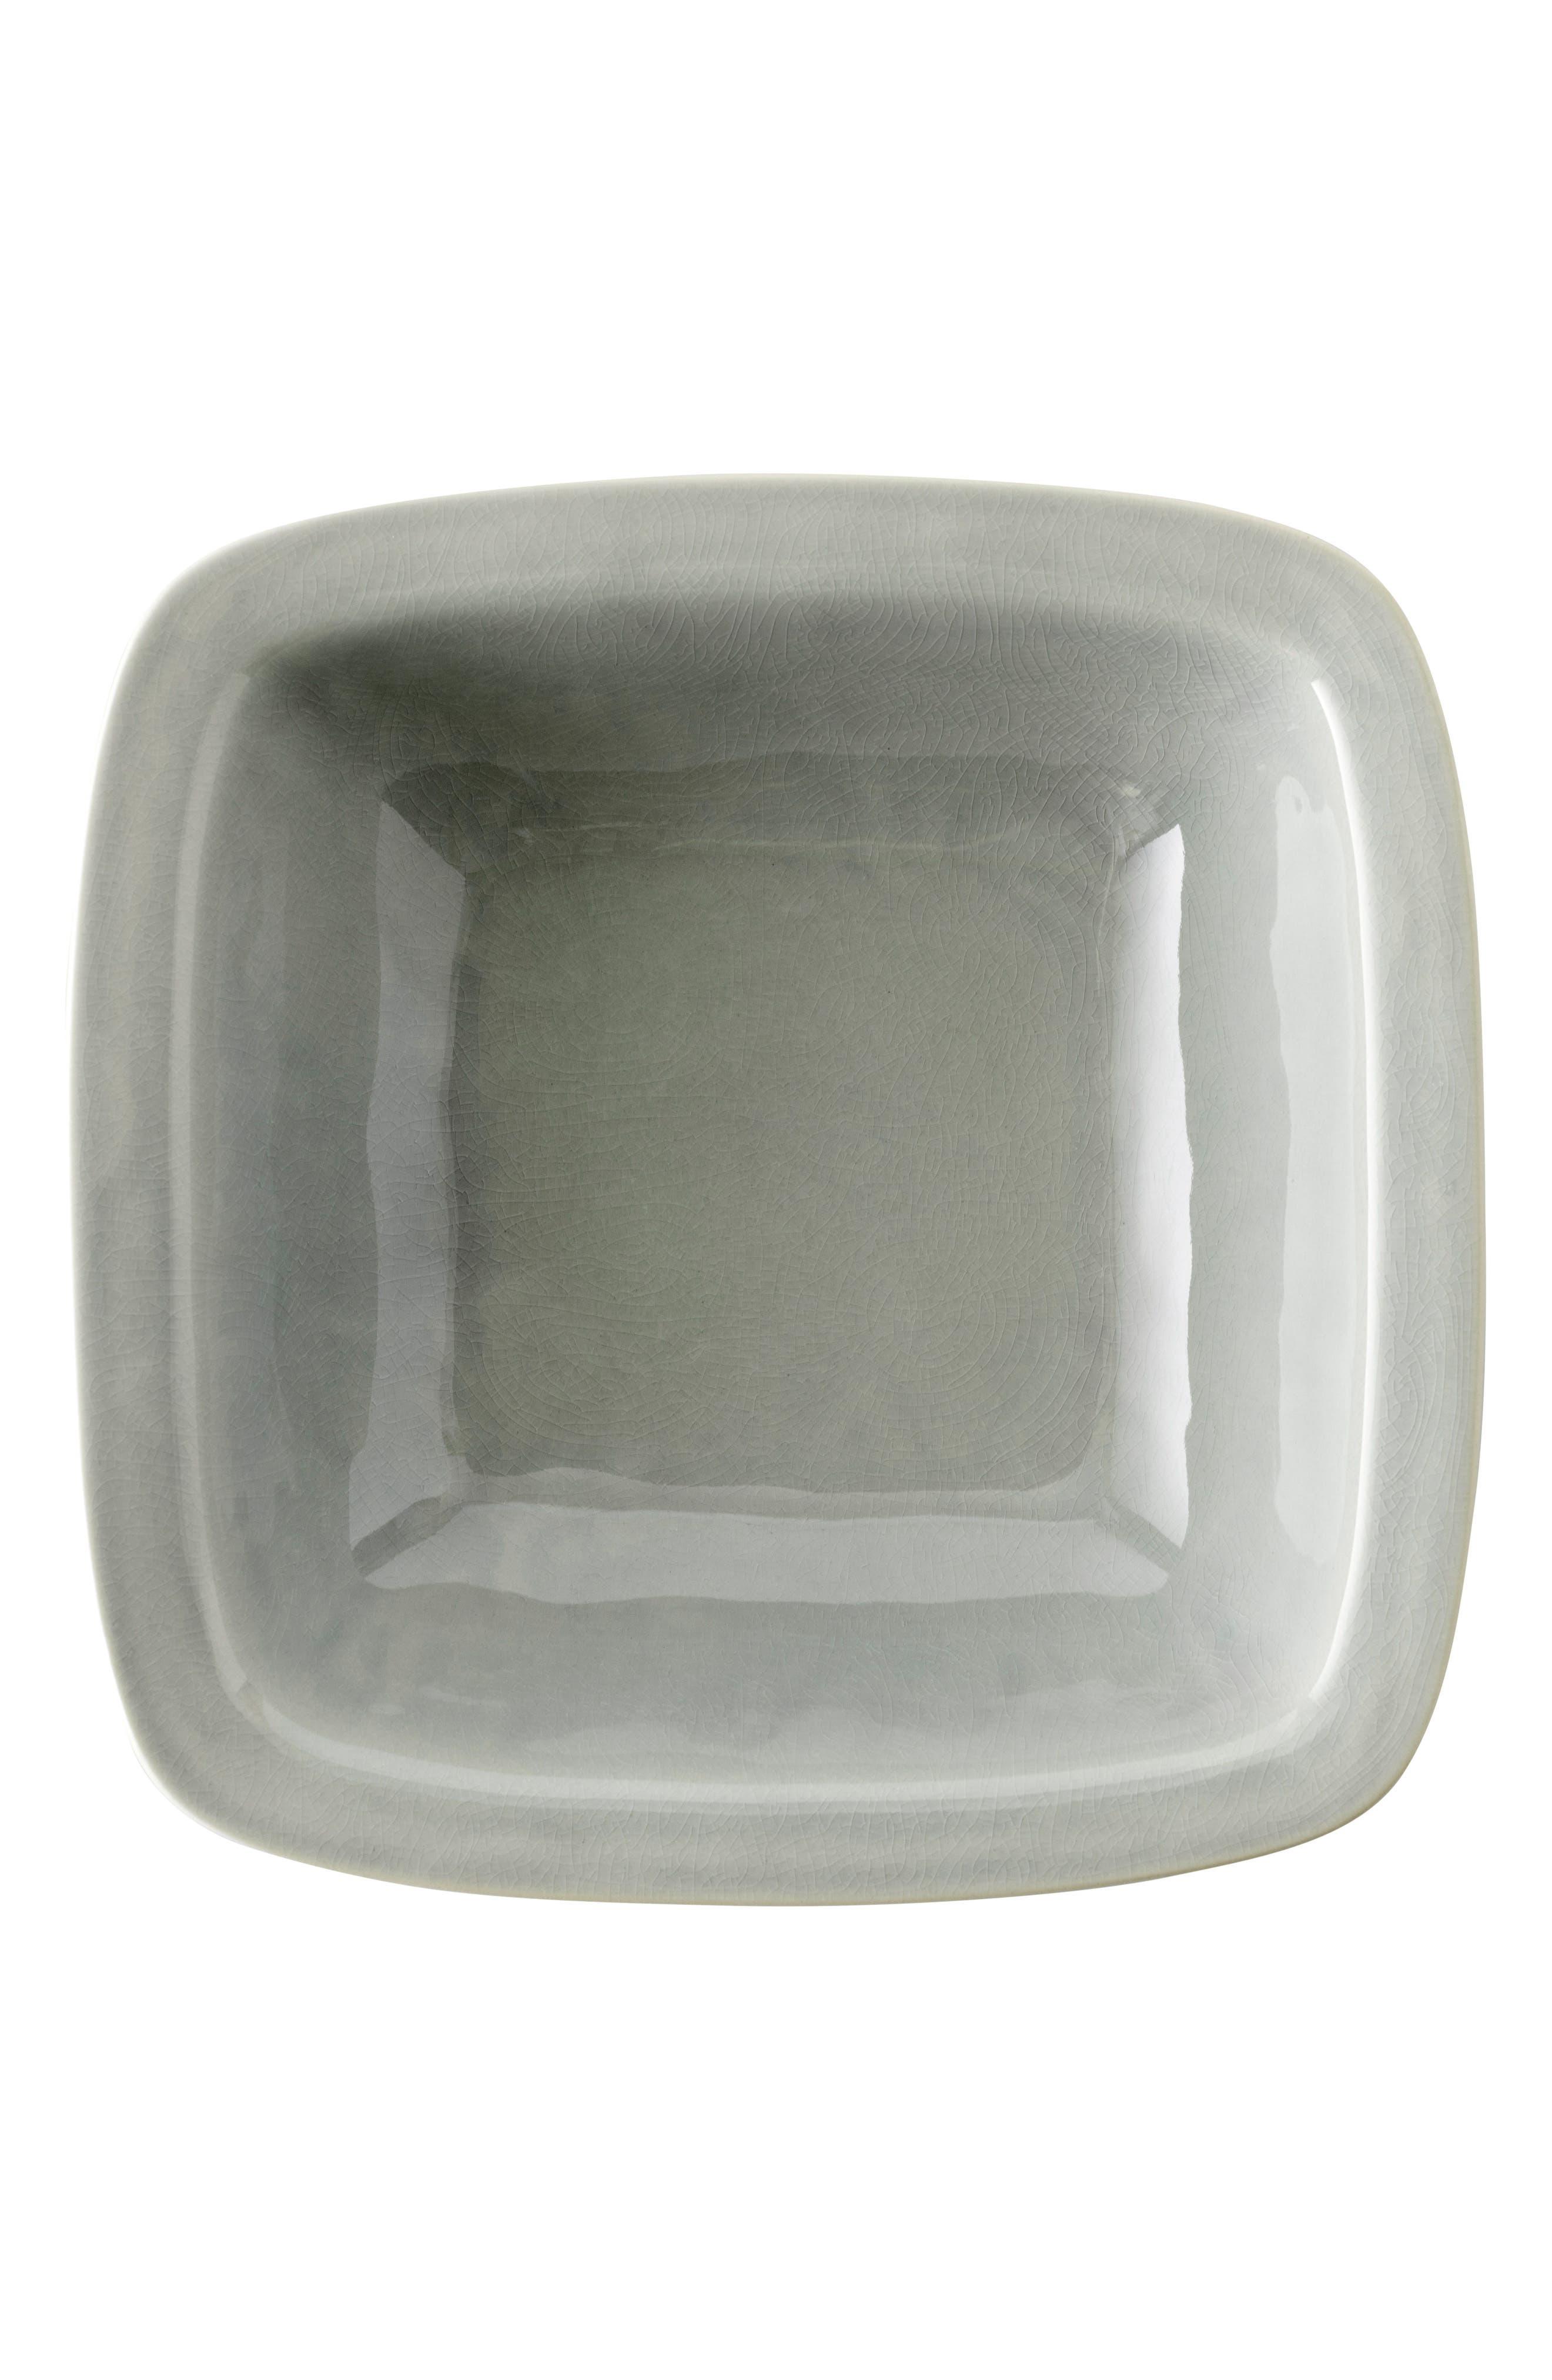 Puro Large Ceramic Serving Bowl,                             Alternate thumbnail 2, color,                             MIST GREY CRACKLE